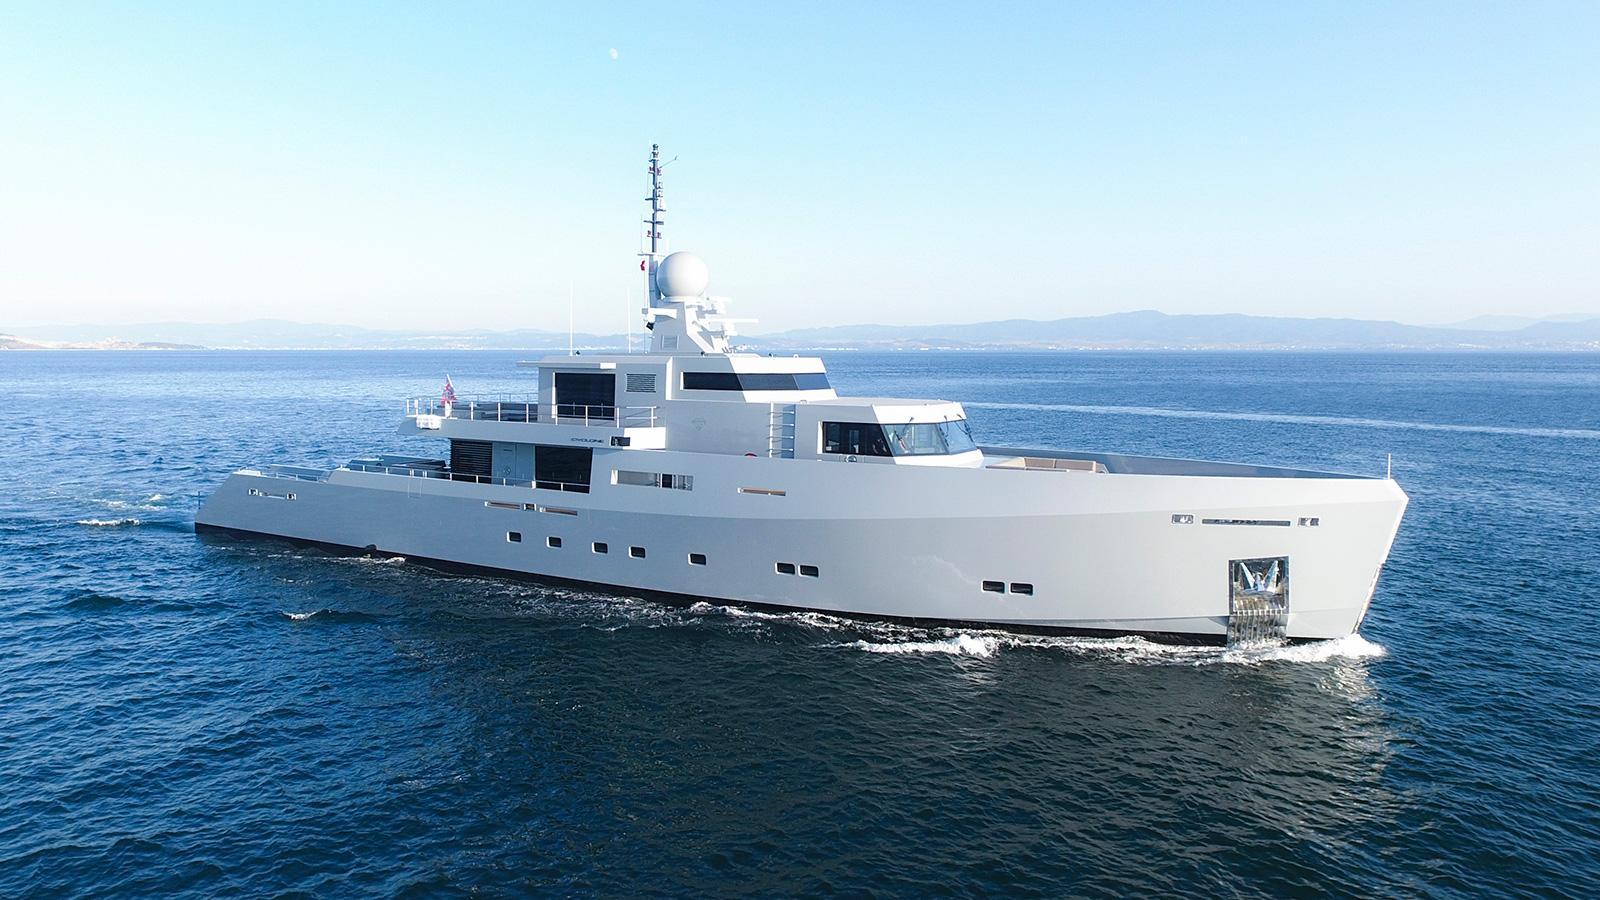 cyclone motoryacht tansu yachts 44m 2017 half profile cruising